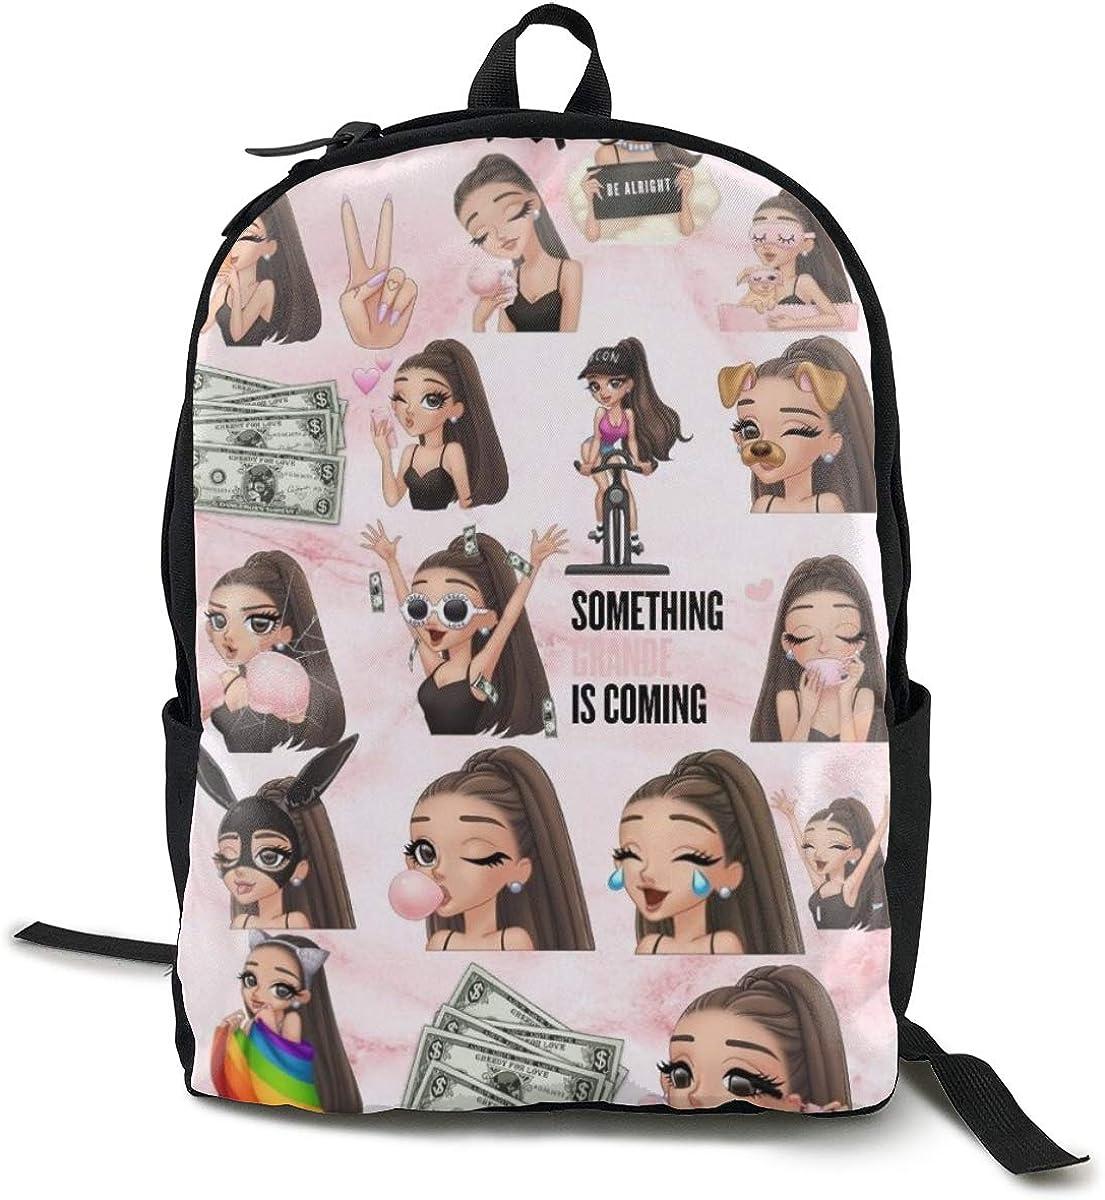 Unisex Leisure Student Durable Bookbag Canvas Travel Daypack For Boy Girl